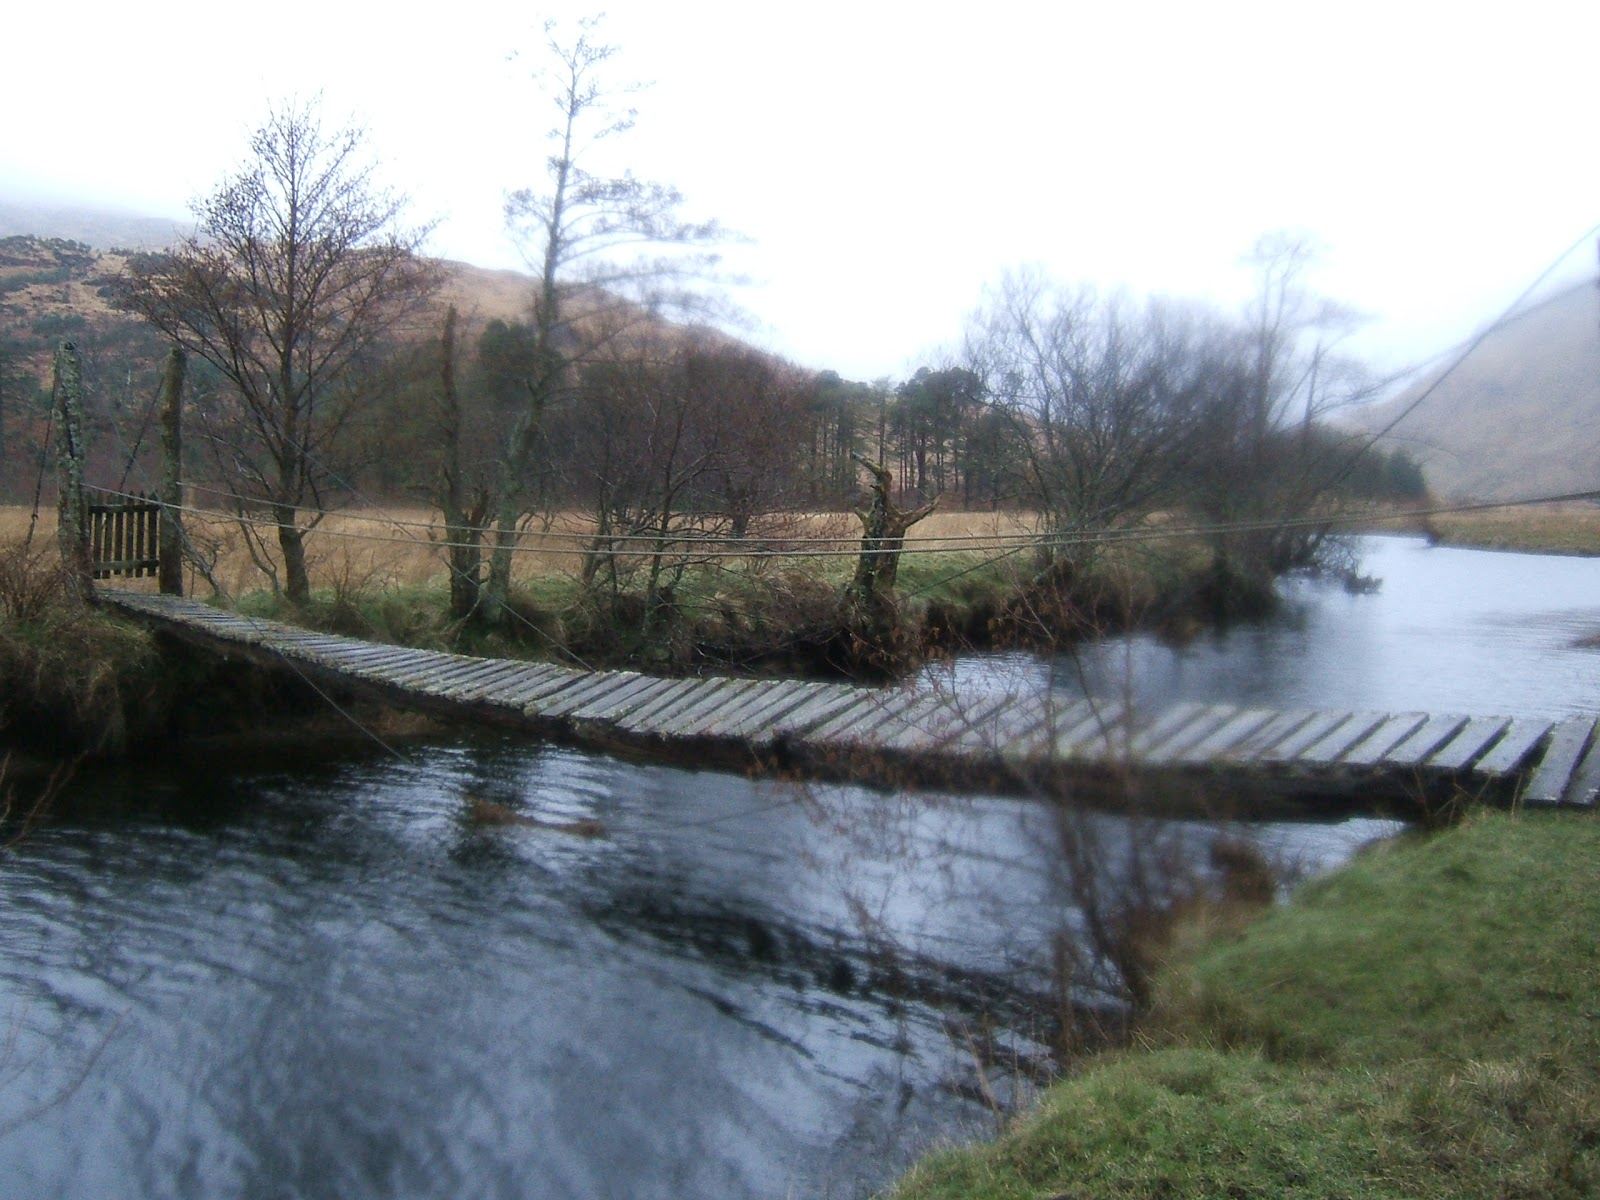 bridge on the river - photo #6